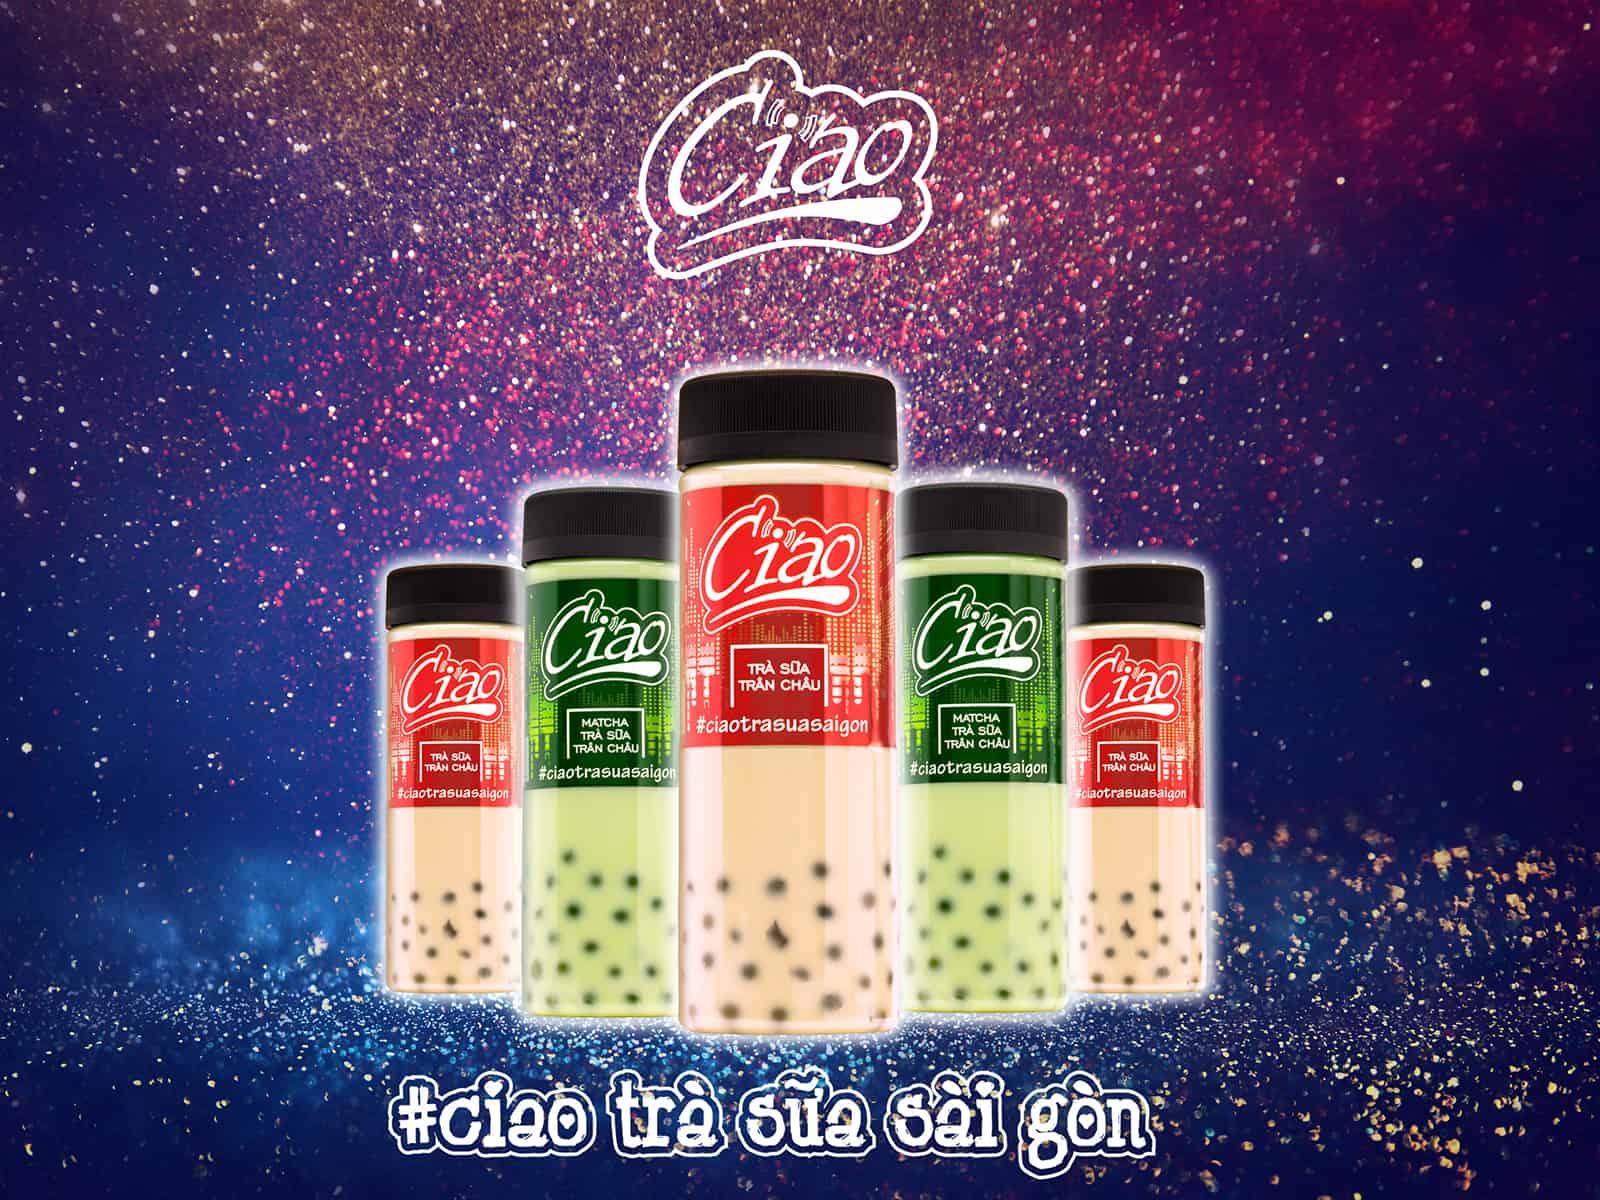 Trà Sữa Ciao - Ciao Trà Sữa Sài Gòn - 03